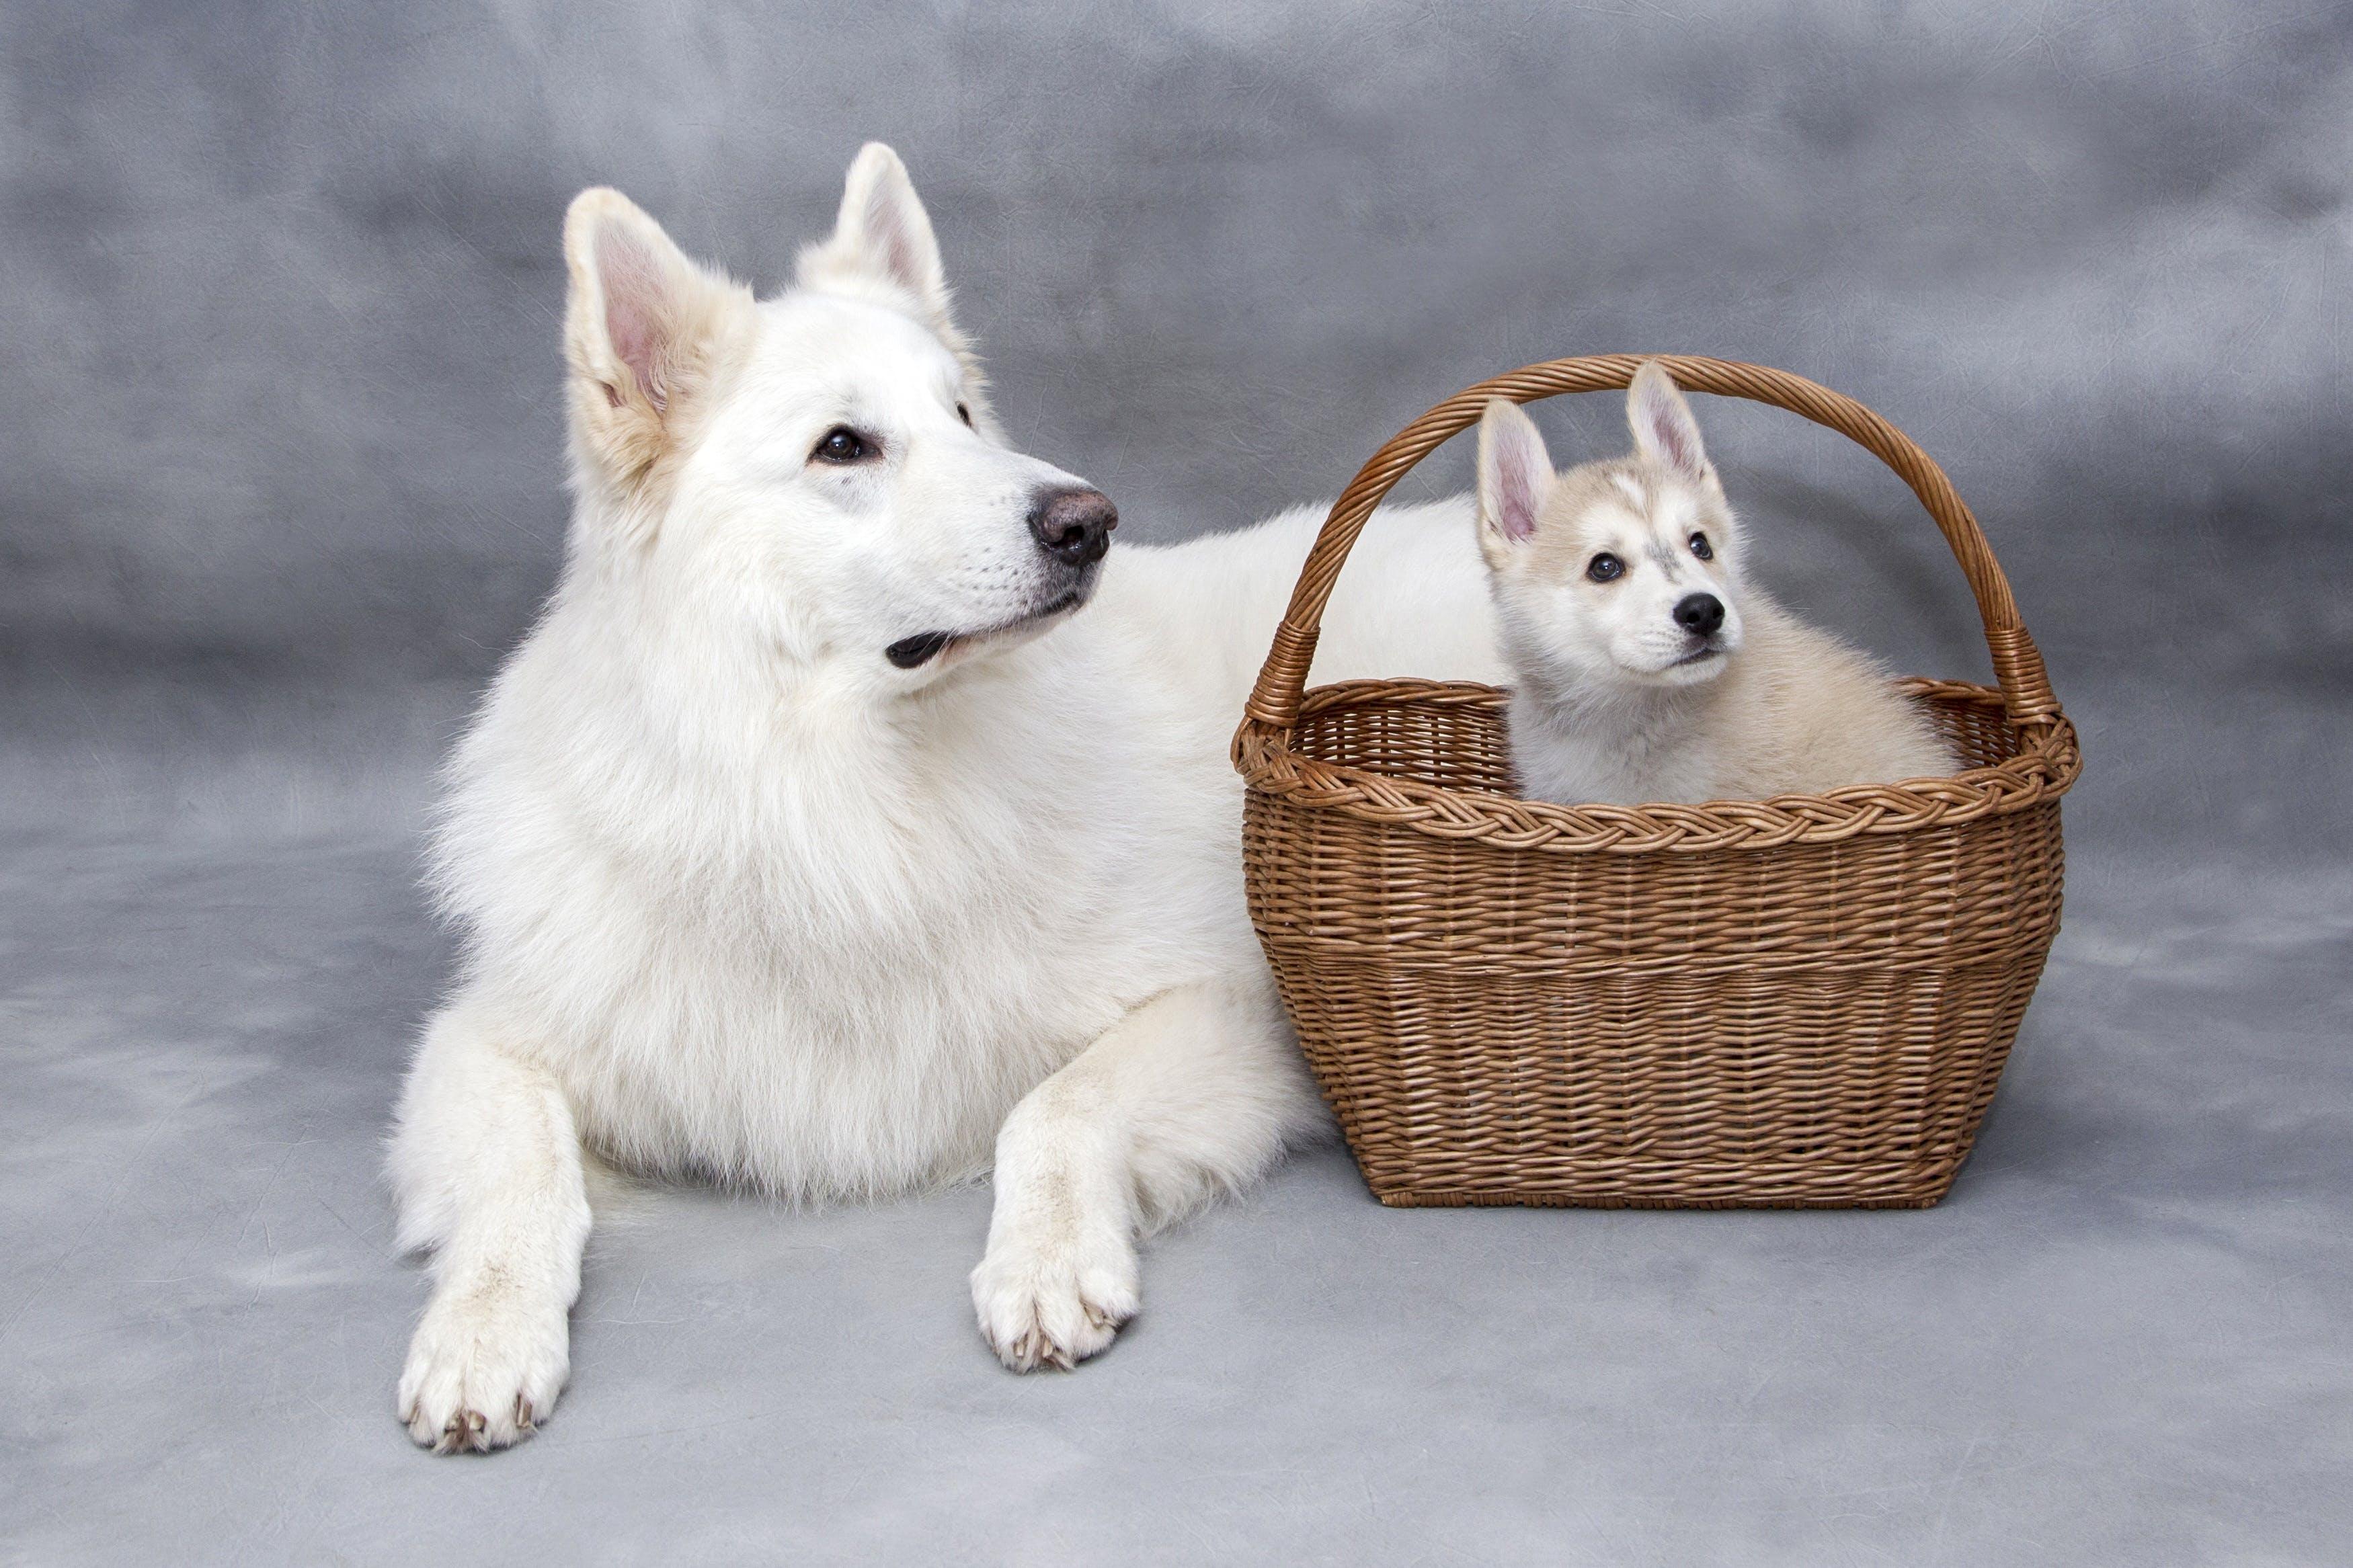 Free stock photo of dog, pet, cute, animals